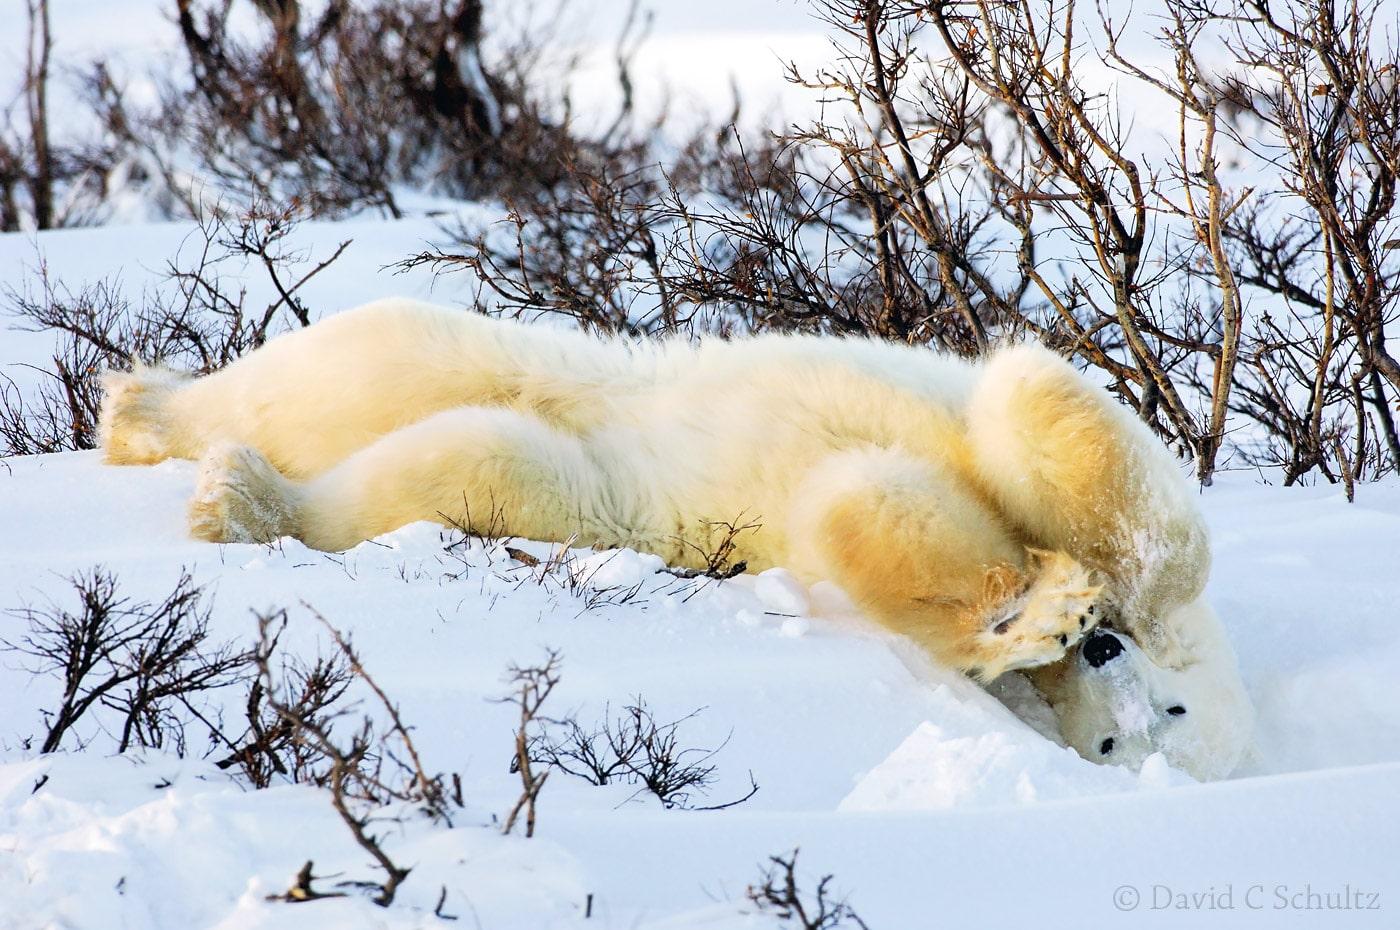 Polar bear, Canada - Image #168-518